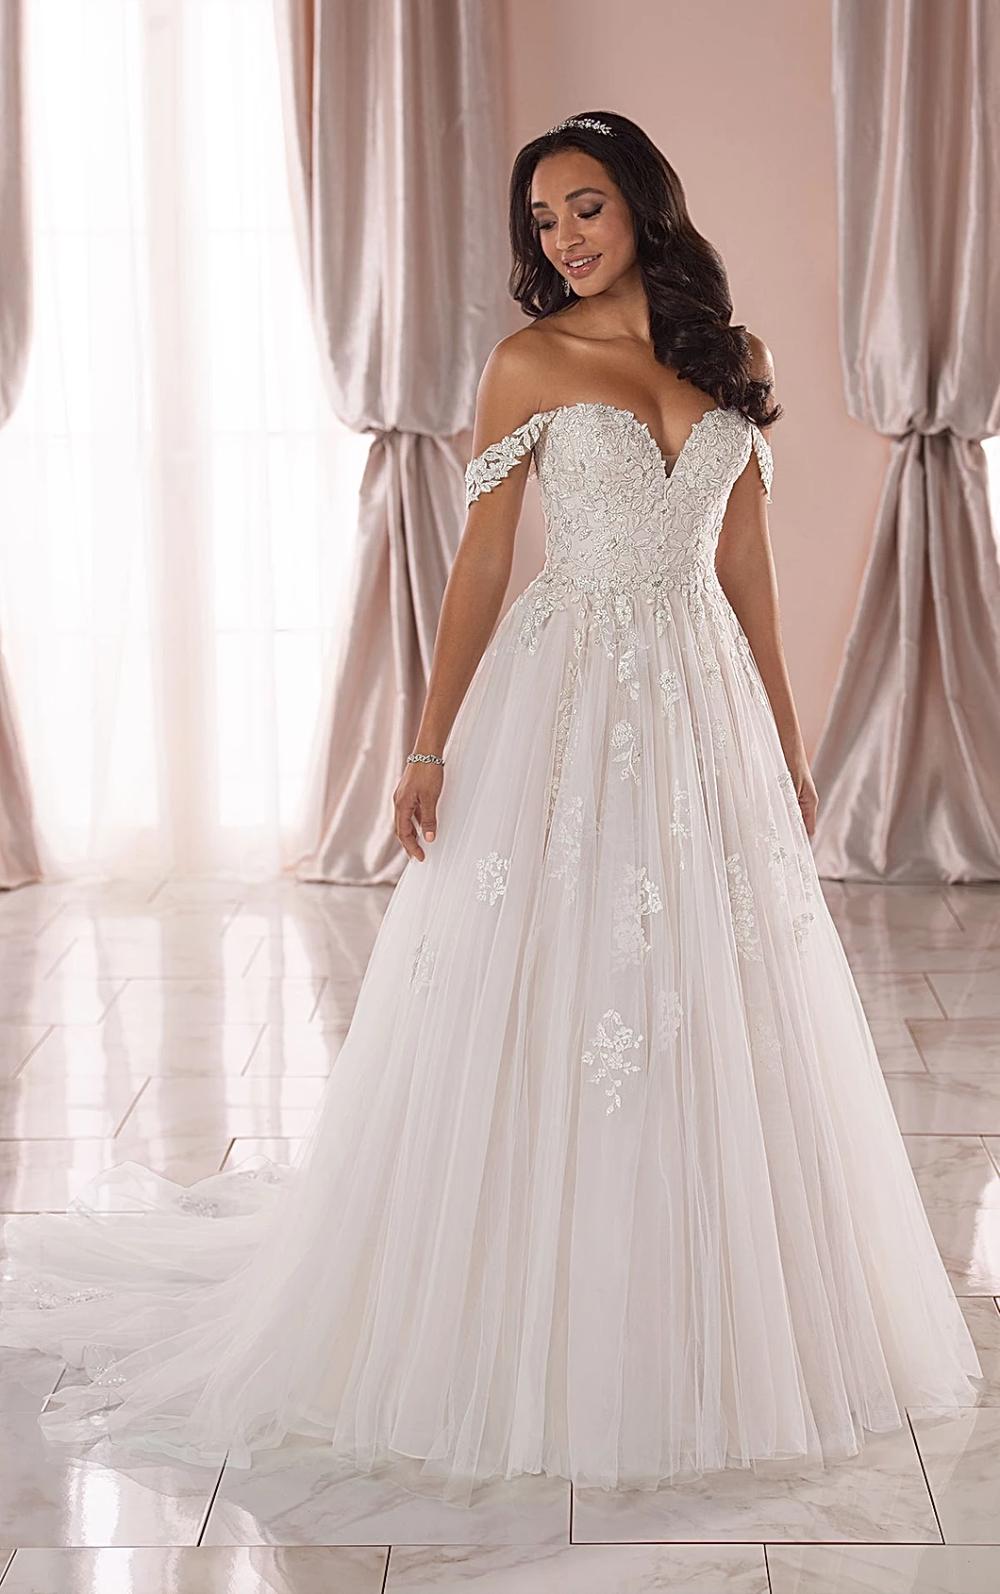 Plus Size Wedding Dresses In 2020 Stella York Wedding Dress Wedding Dresses Lace York Wedding Dress